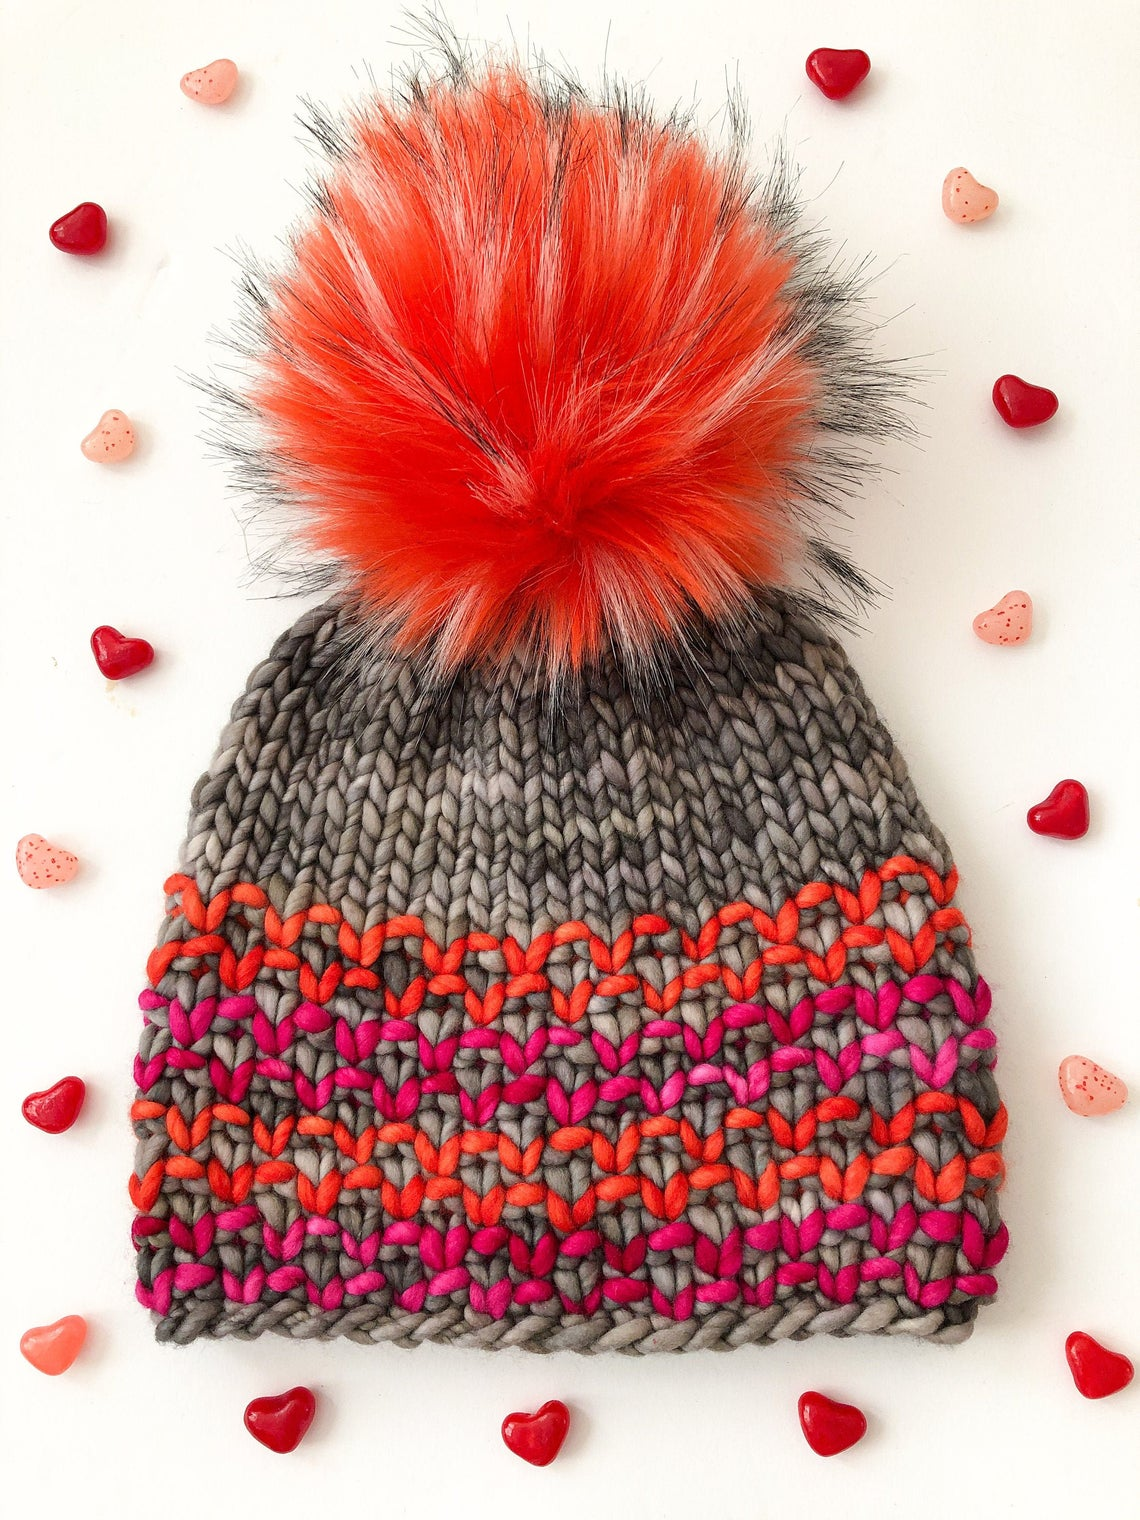 Designer Spotlight: Cozy & Colorful Knitting Patterns From Aspen Leaf Knits